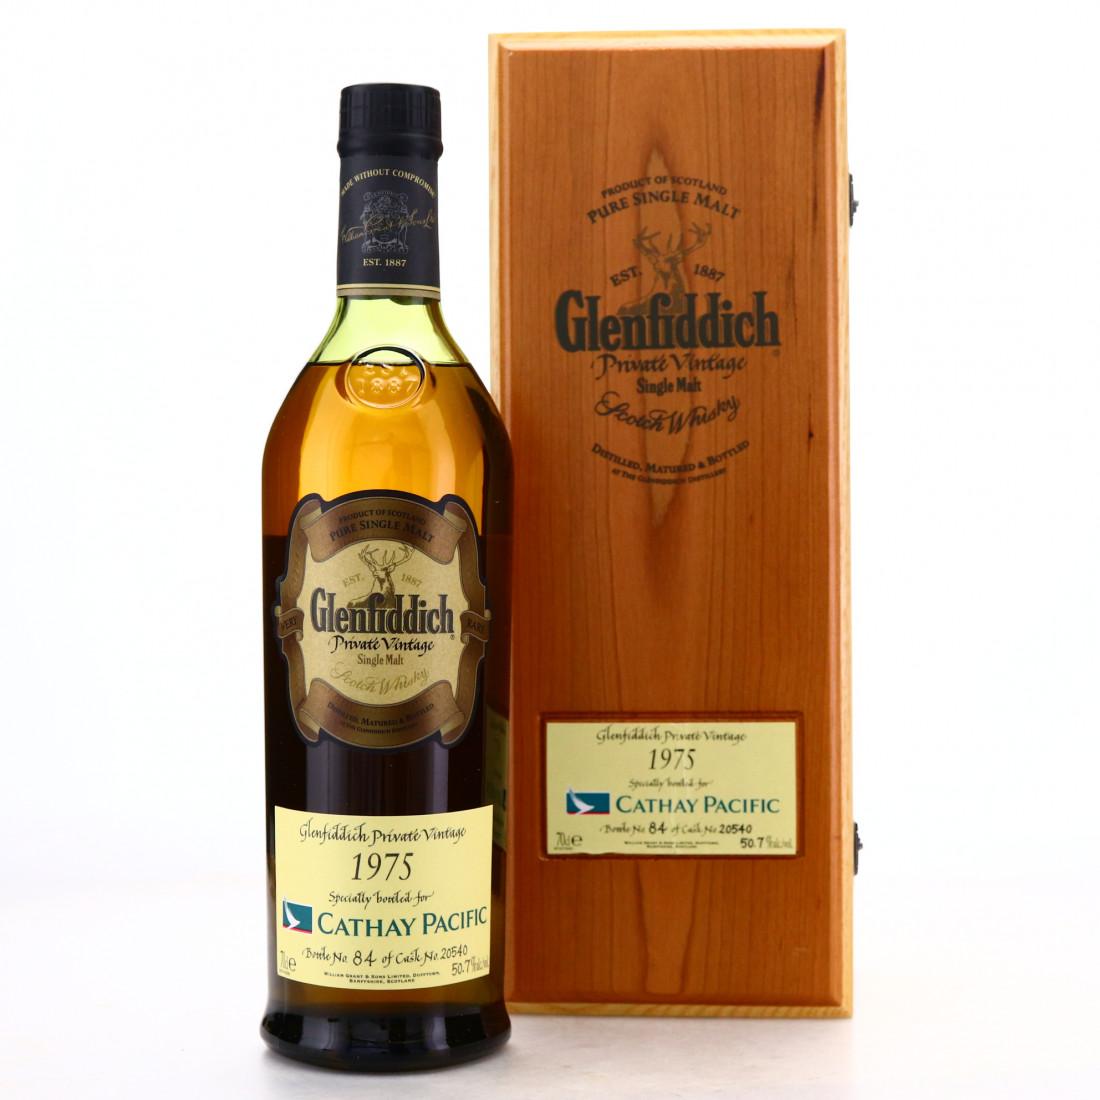 Glenfiddich 1975 Private Vintage #20540